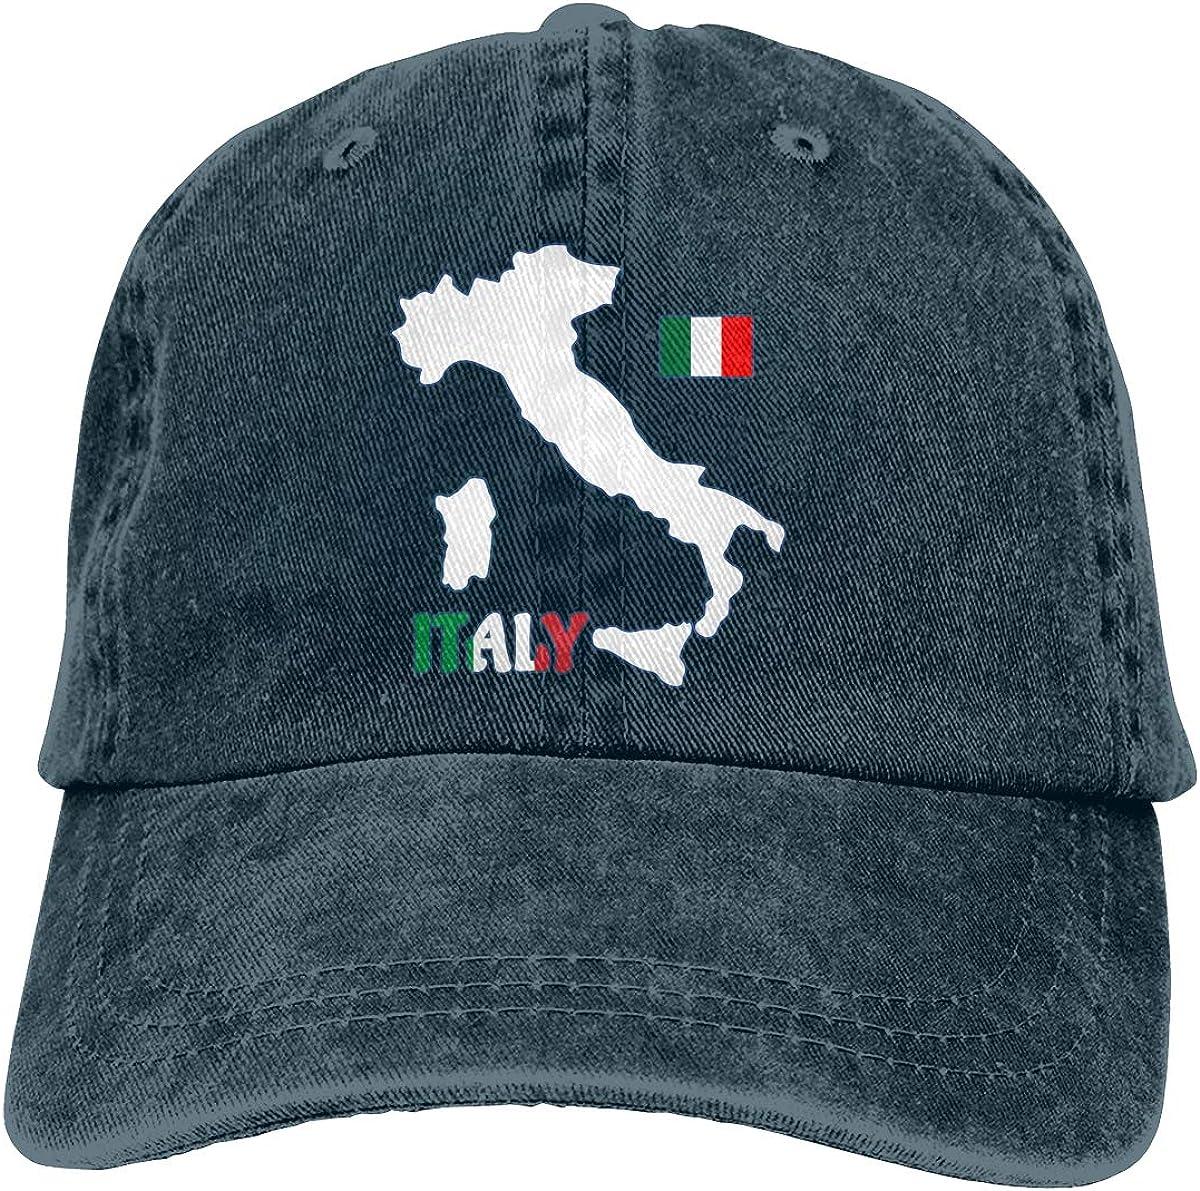 Best4U/&Me Unisex Italy Map Flag Vintage Washed Dad Hat Fashion Adjustable Baseball Cap